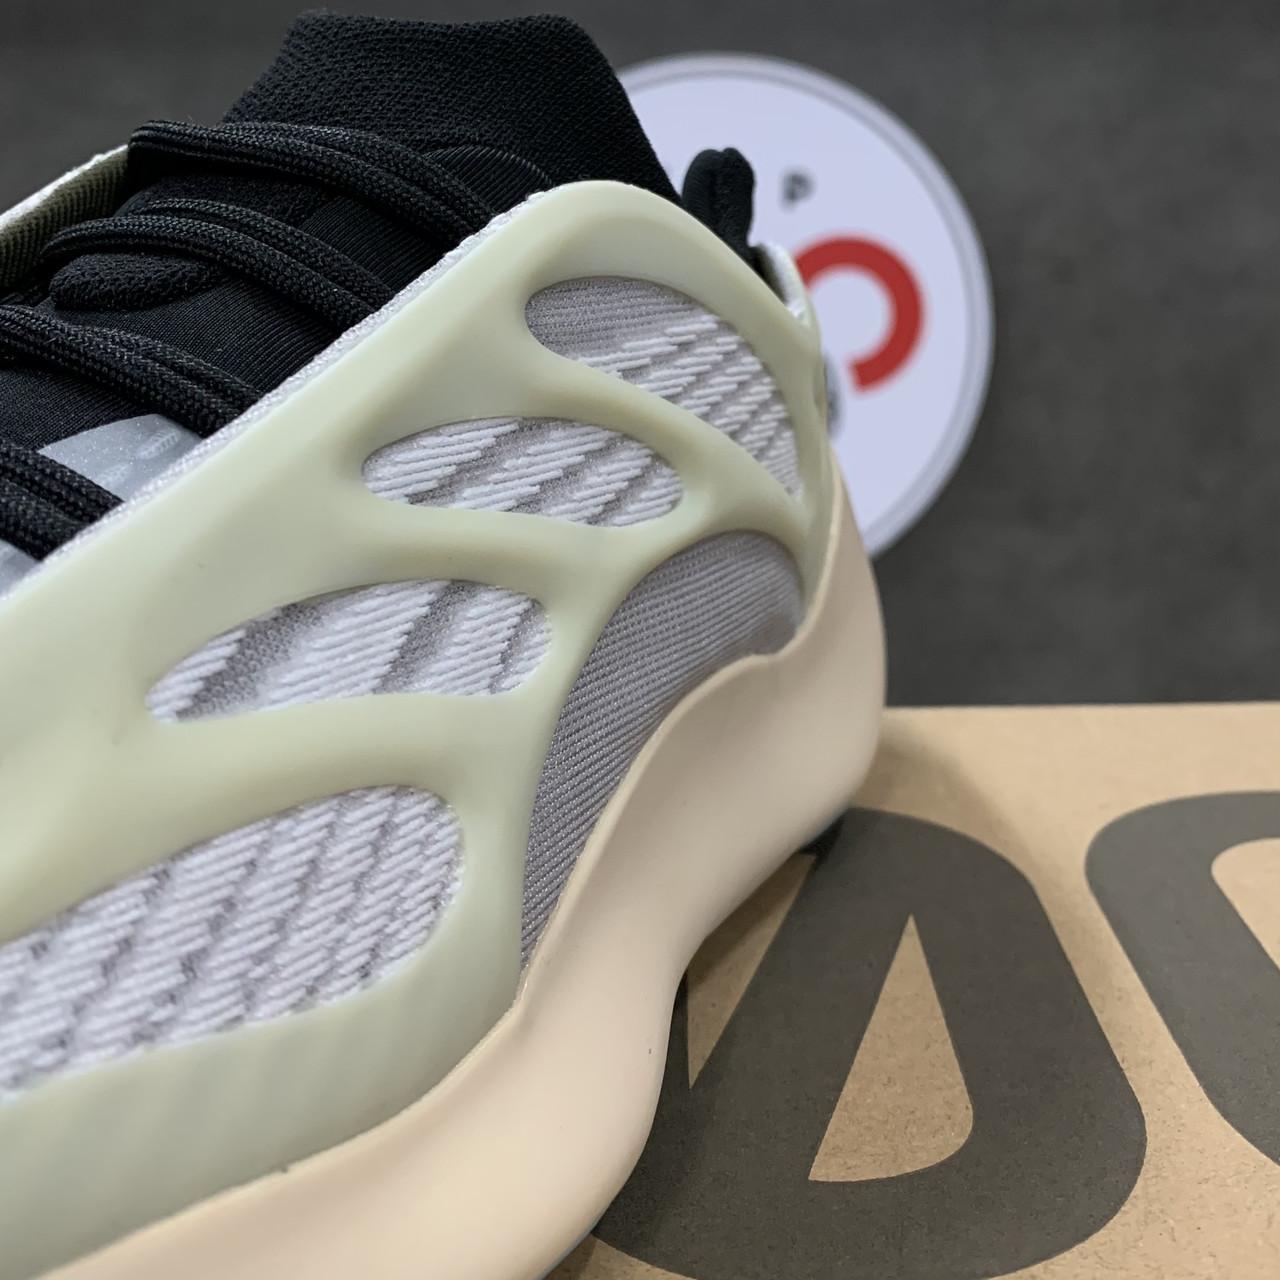 Кроссовки Adidas Yeezy Boost 700 V3 - фото 3